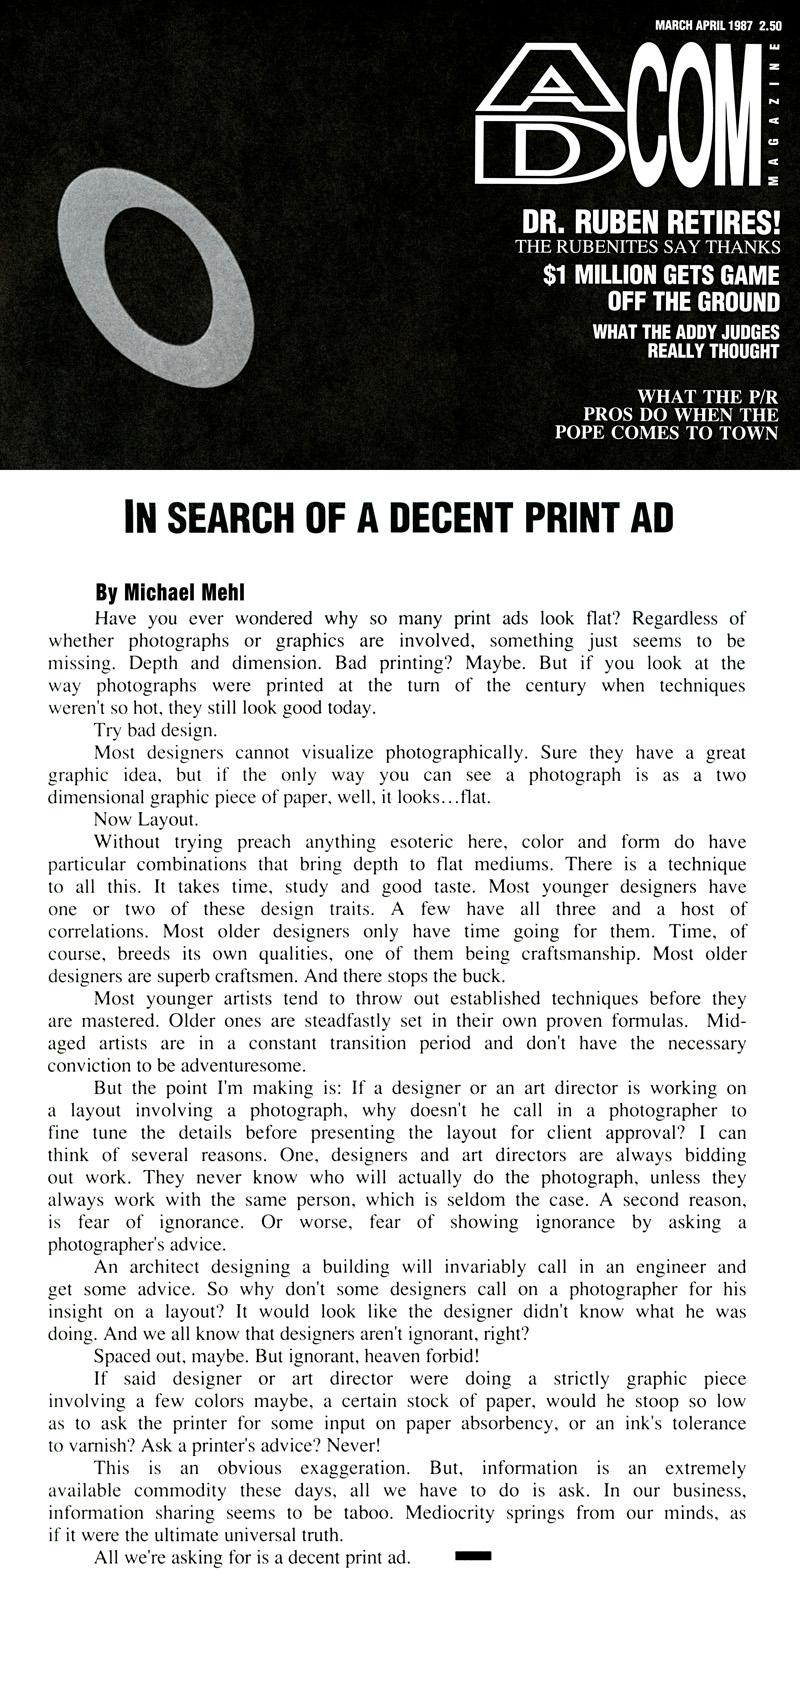 1987_Michael-Mehl_The-Highlight-Zone_Ad-Com-Magazine-Column_02